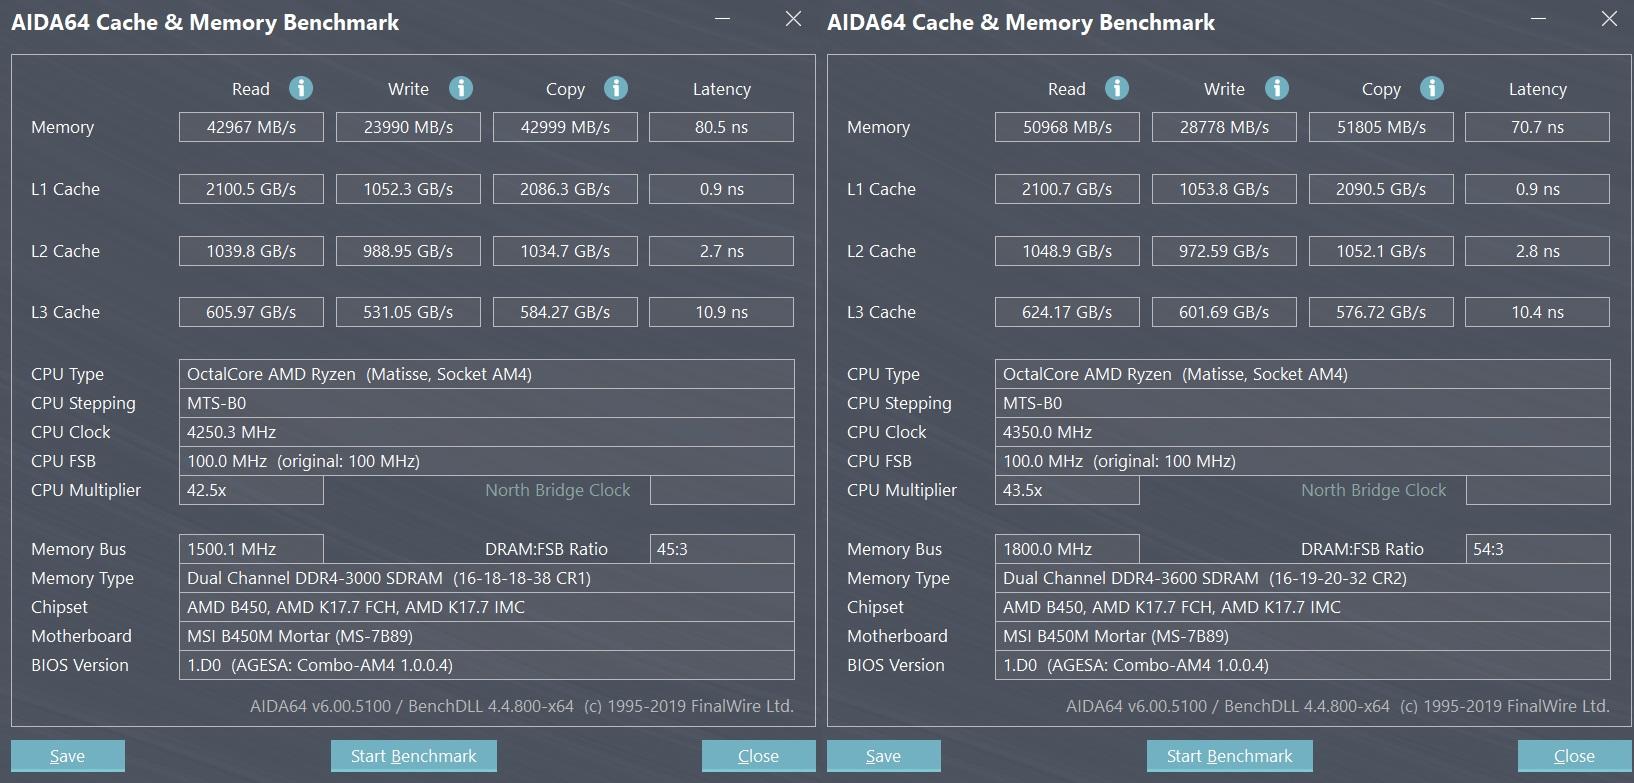 AIDA64-memory-benchmark-final